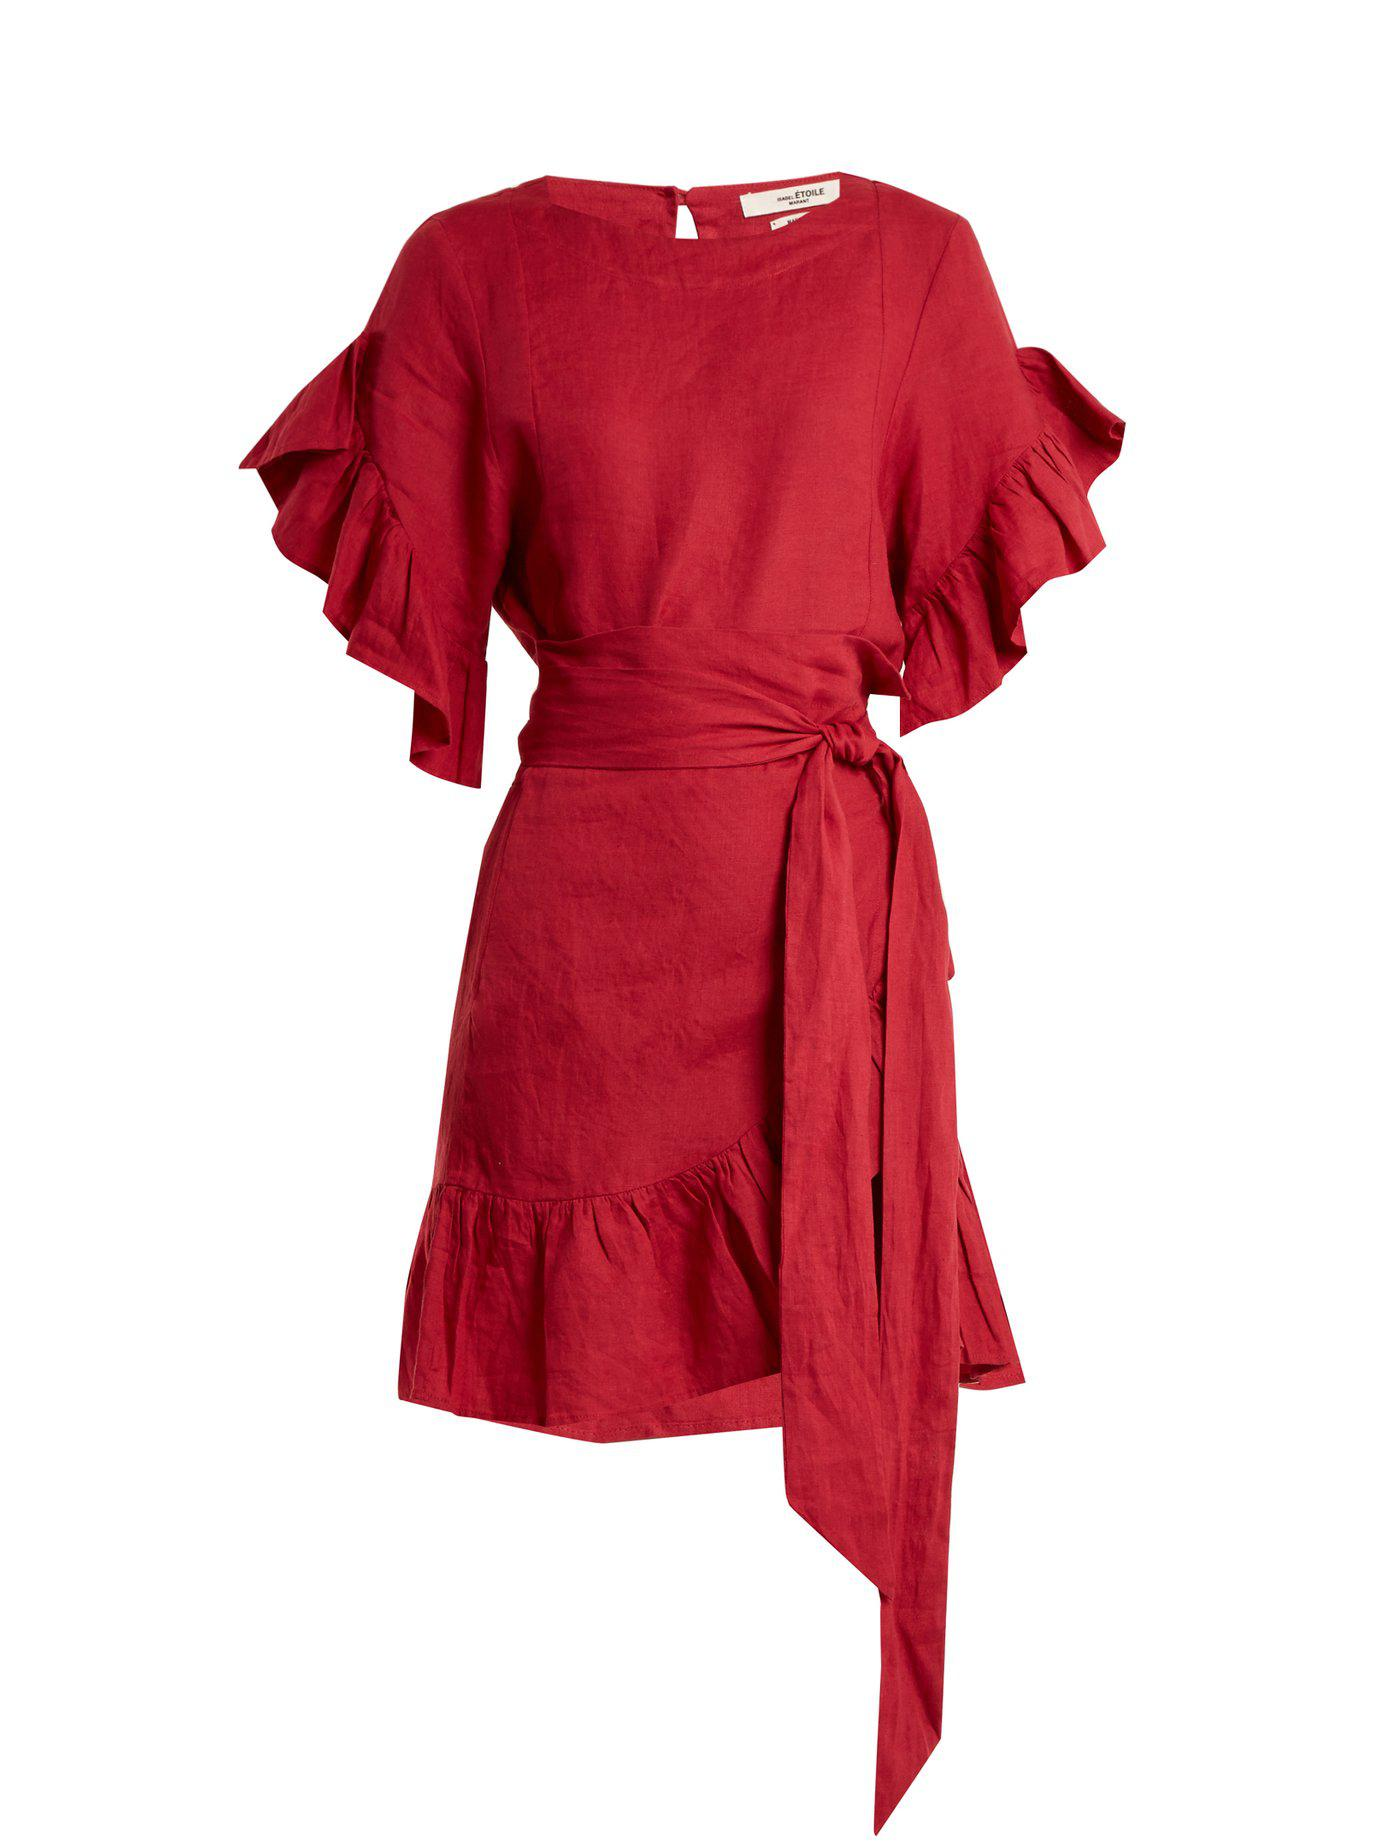 Red Delicia À Isabel Portefeuille Coloris Étoile Marant Robe En Lin Volants gY6vyIbf7